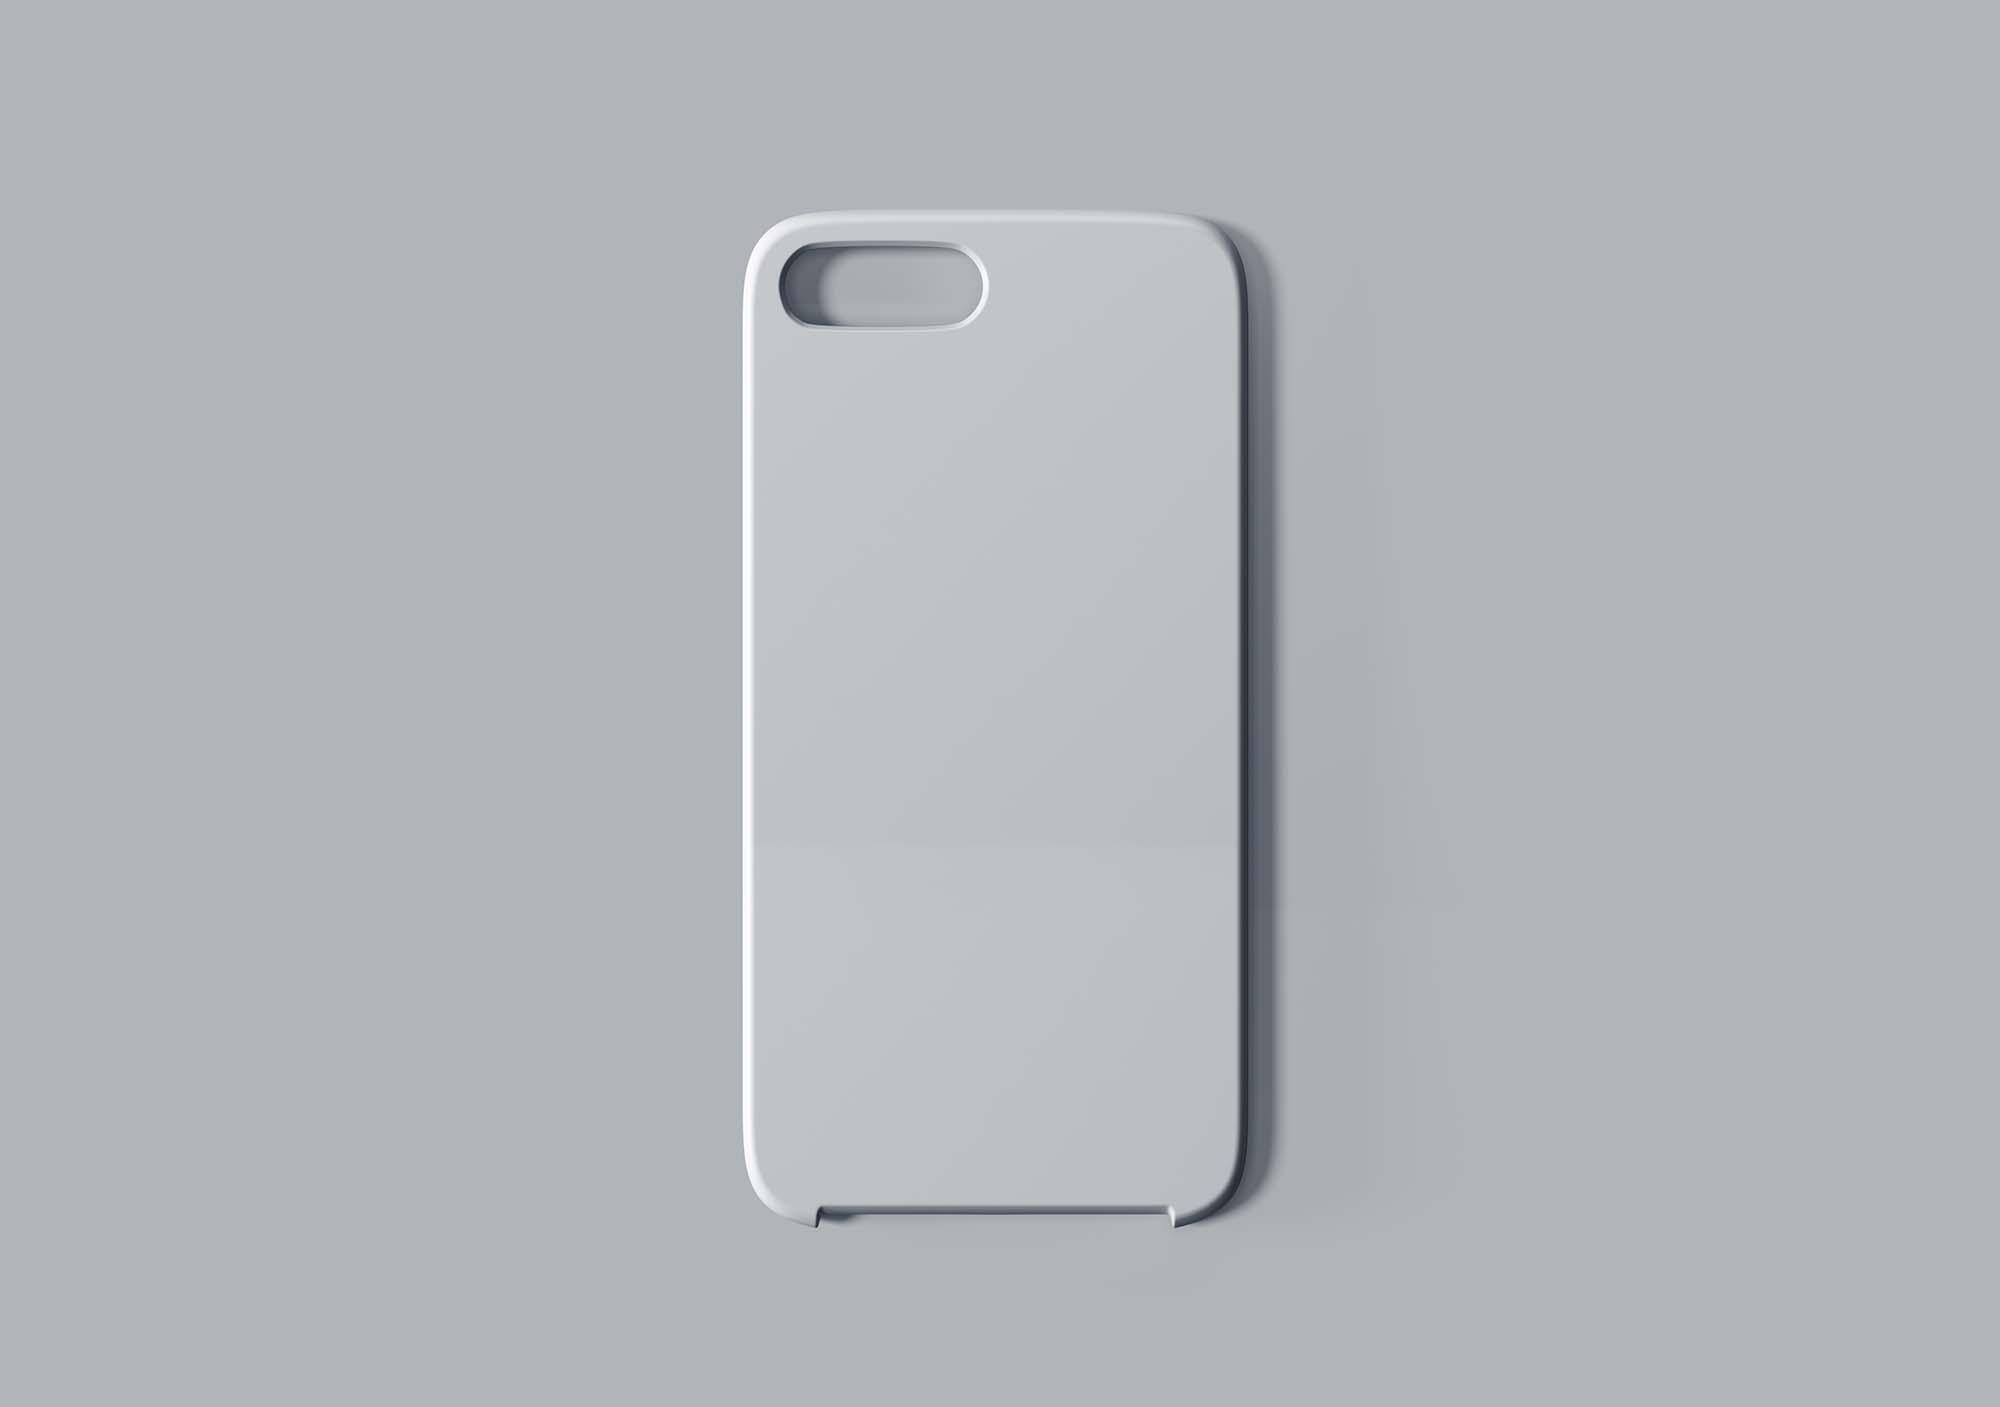 Phone Cover Mockup 2